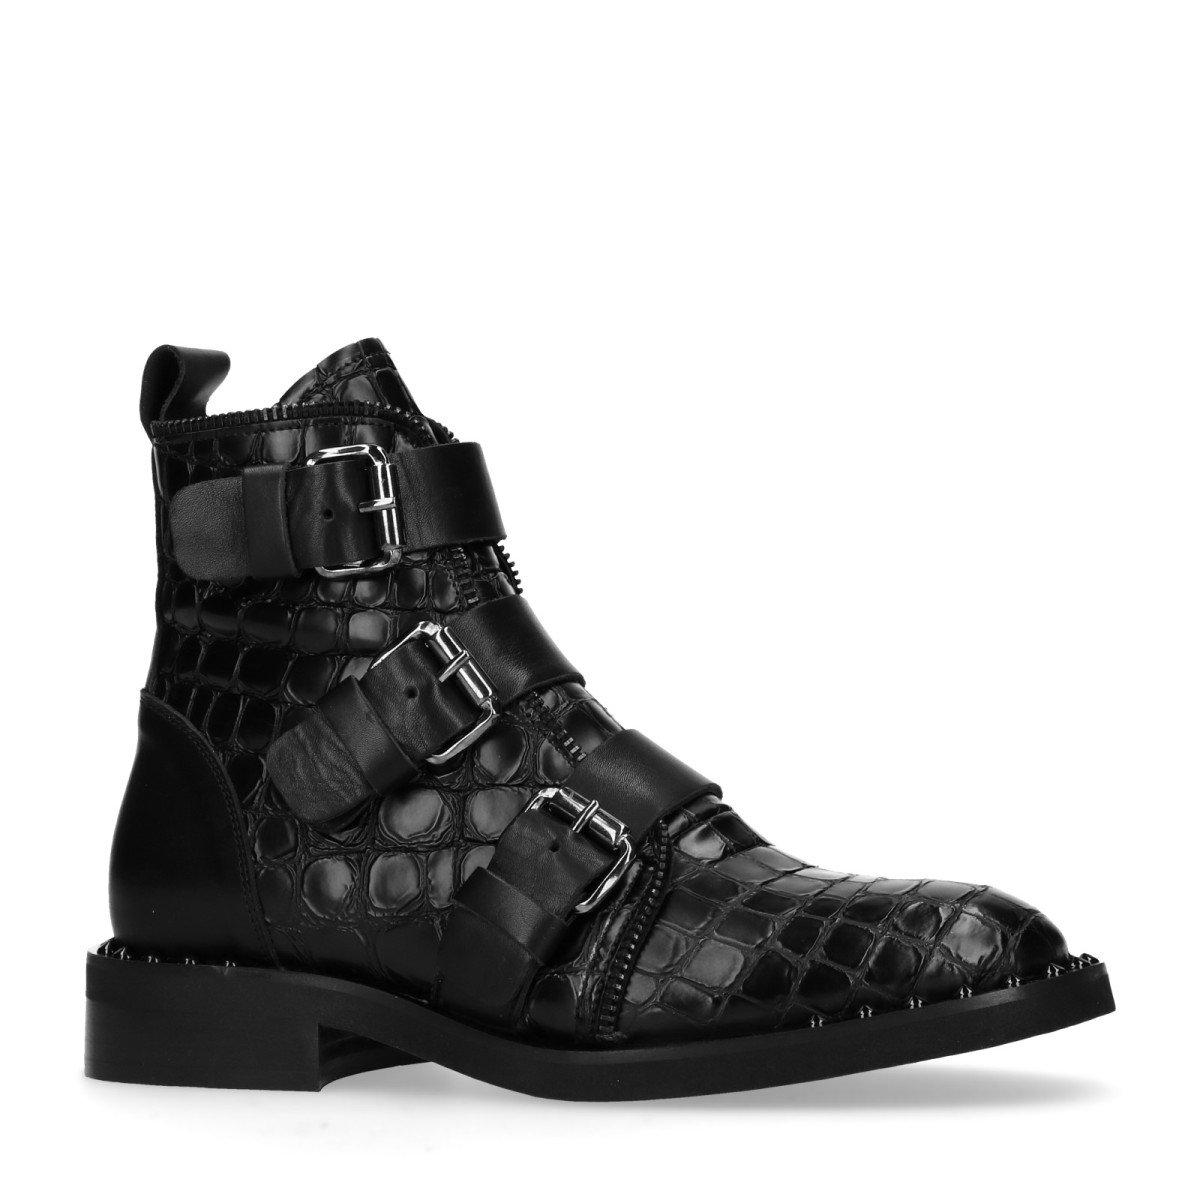 Sacha Schuhe   Damen Biker Boots   Schlangenmuster   Leder